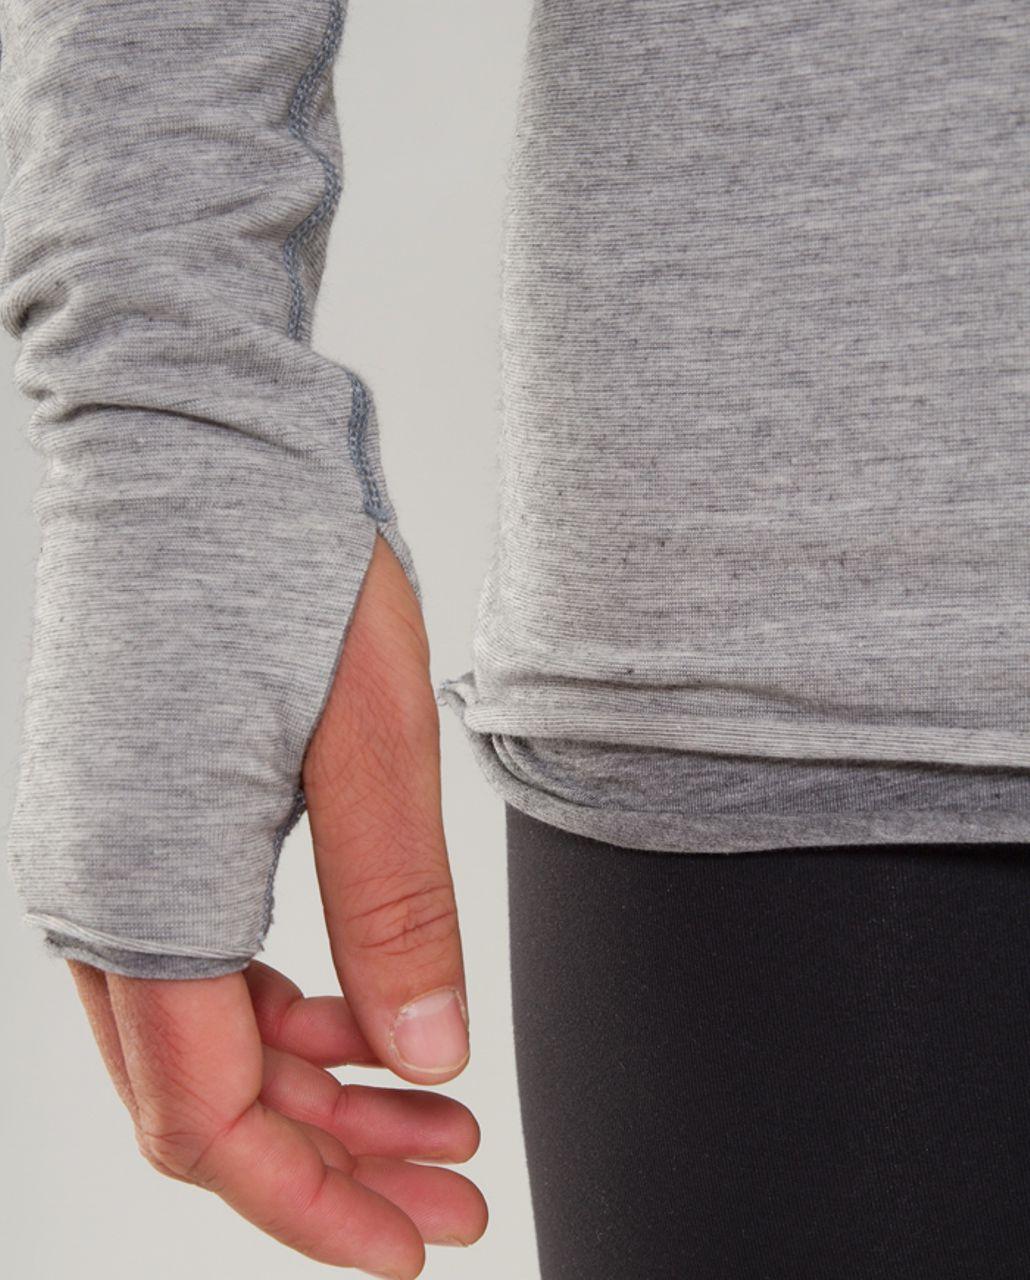 Lululemon Cabin Long Sleeve Tee II - Ghost Blurred Grey Mini Stripe /  Heathered Blurred Grey